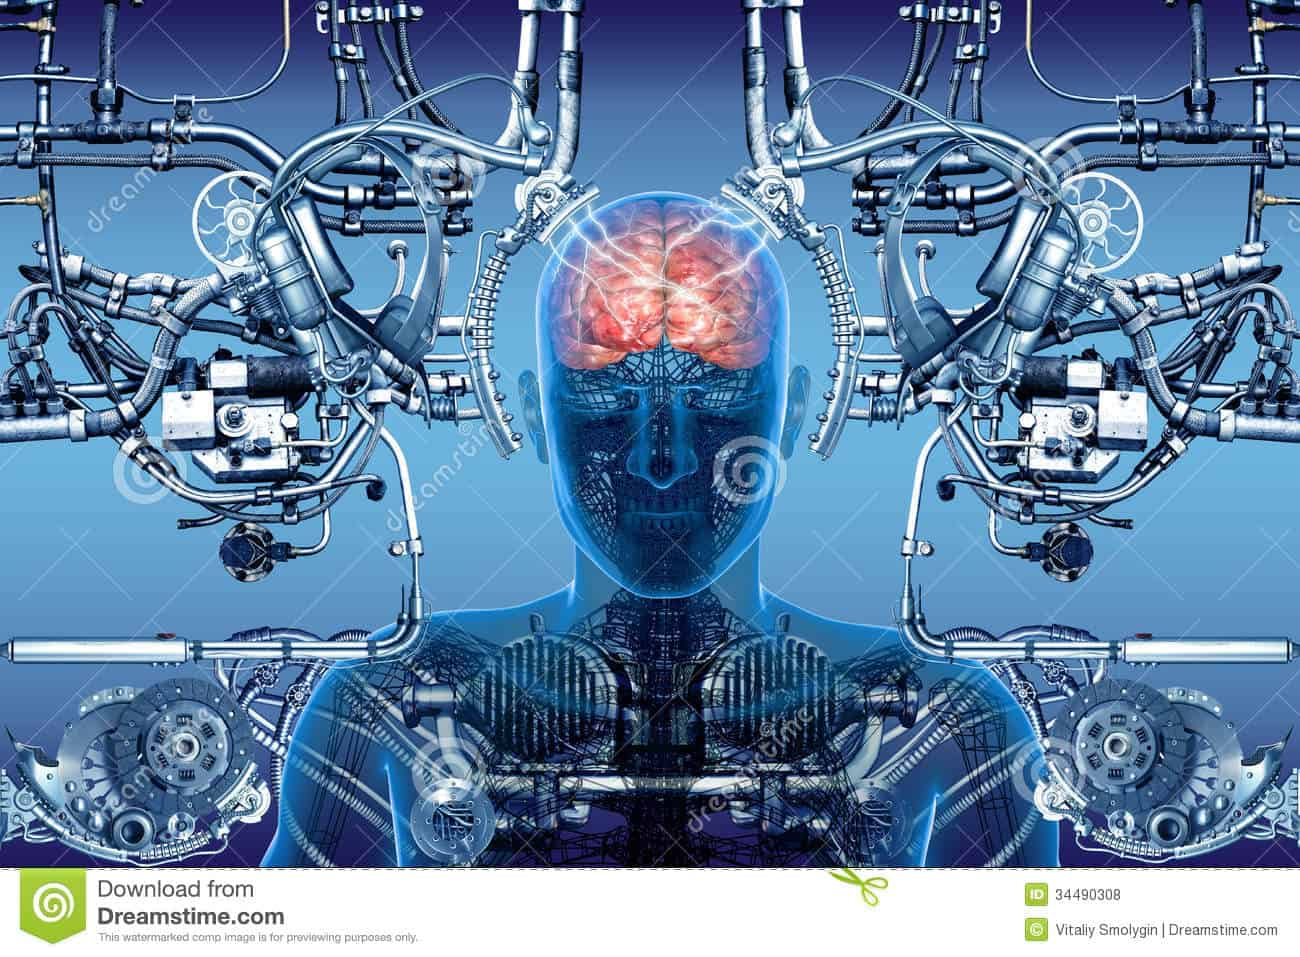 Microwave Mind Control Symptoms & Published Evidence